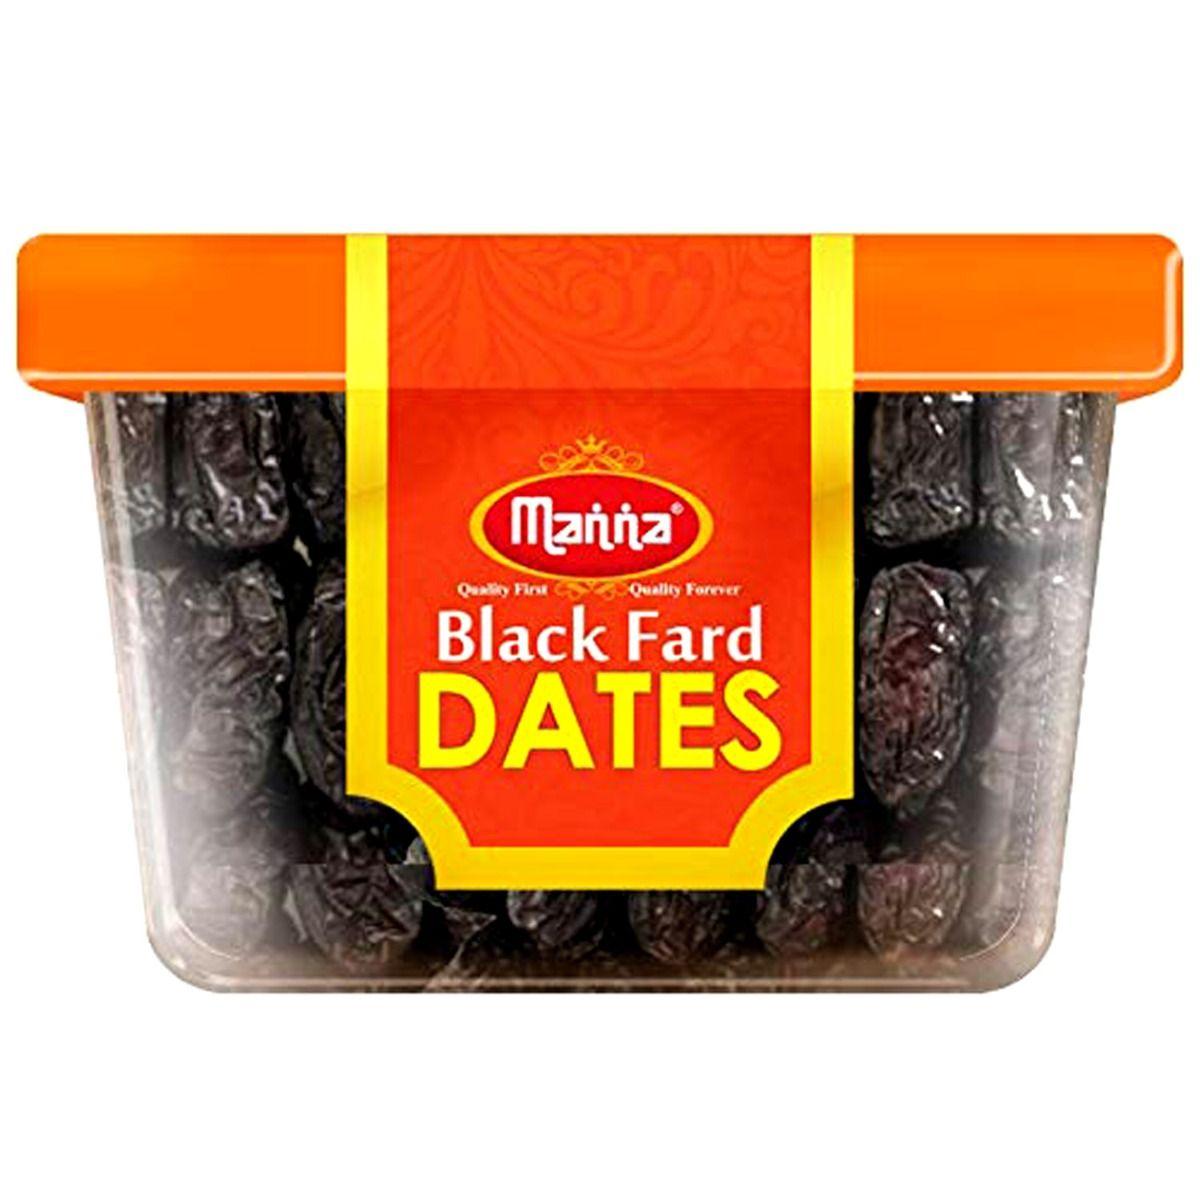 Manna Black Fard Dates, 180 gm, Pack of 1